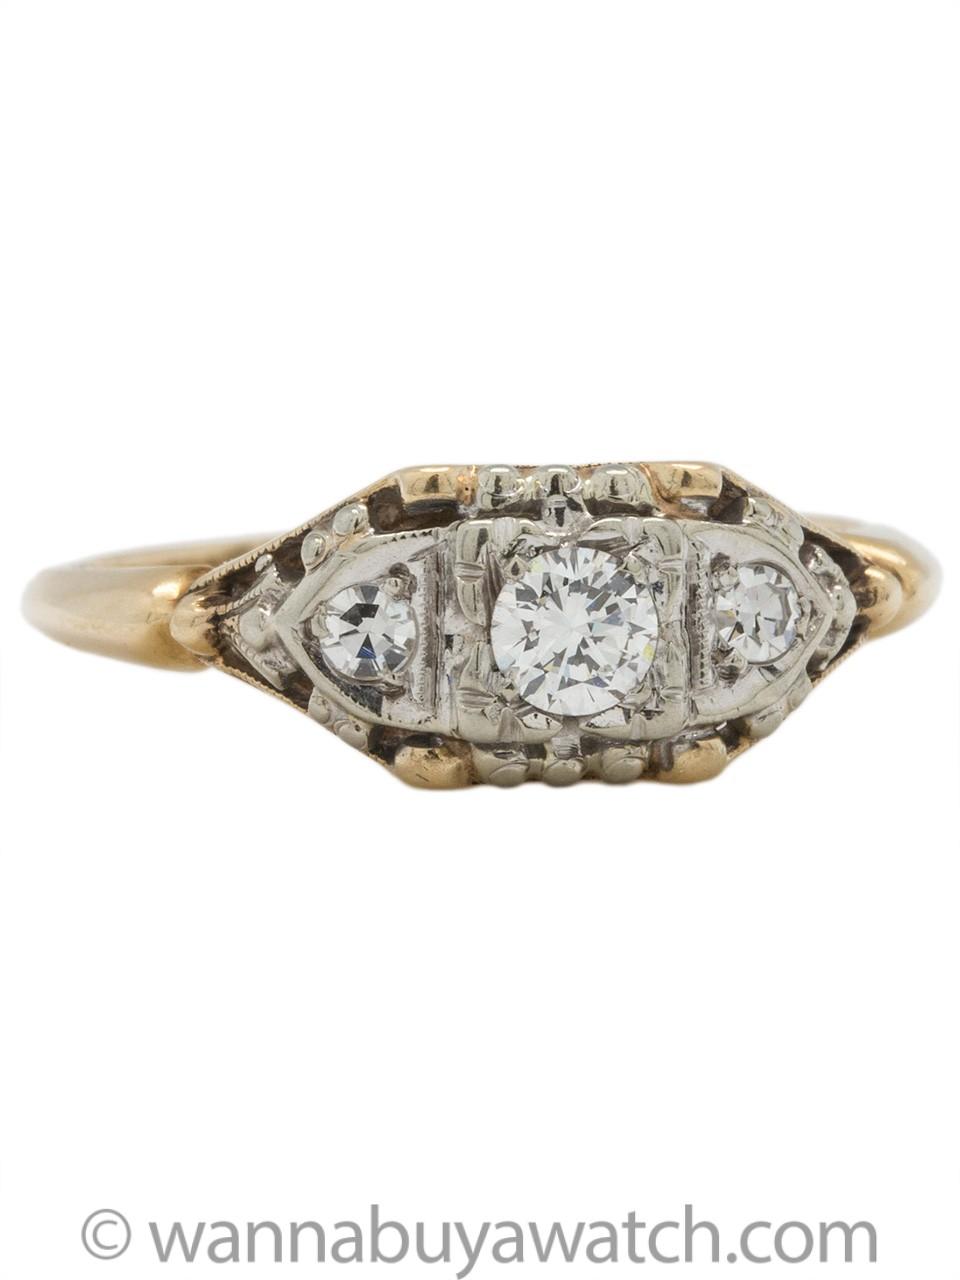 Lovely Antique Engagement Ring 14K YG 0.20ct F-VS2 circa 1940s